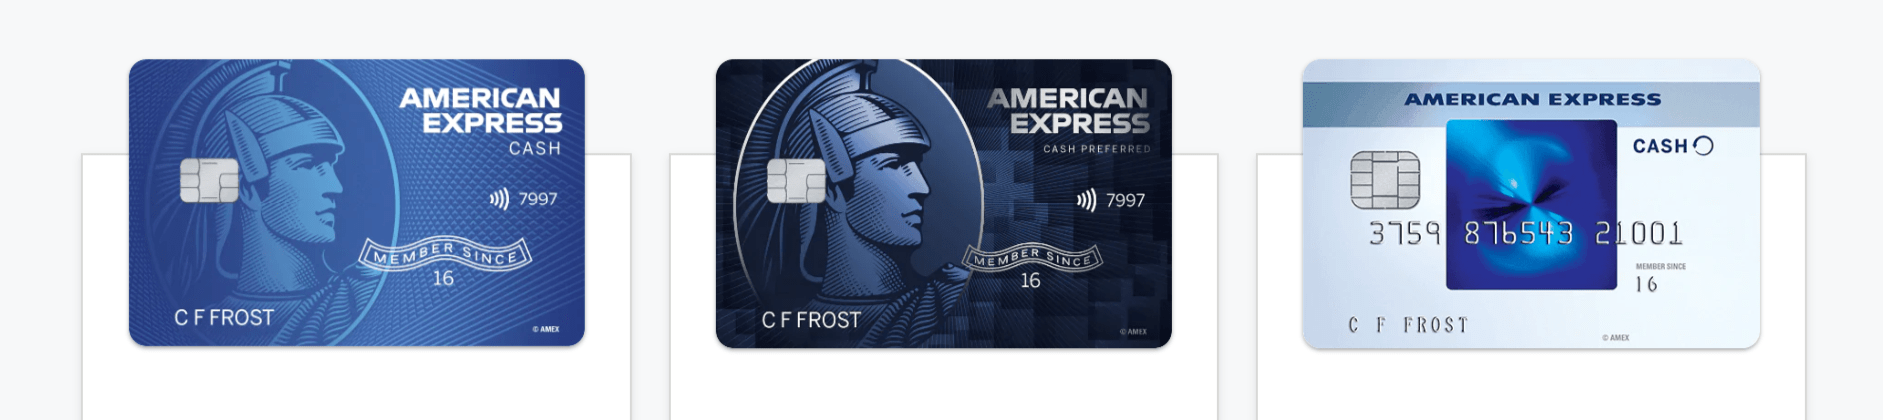 American Express Cashback Credit Cards